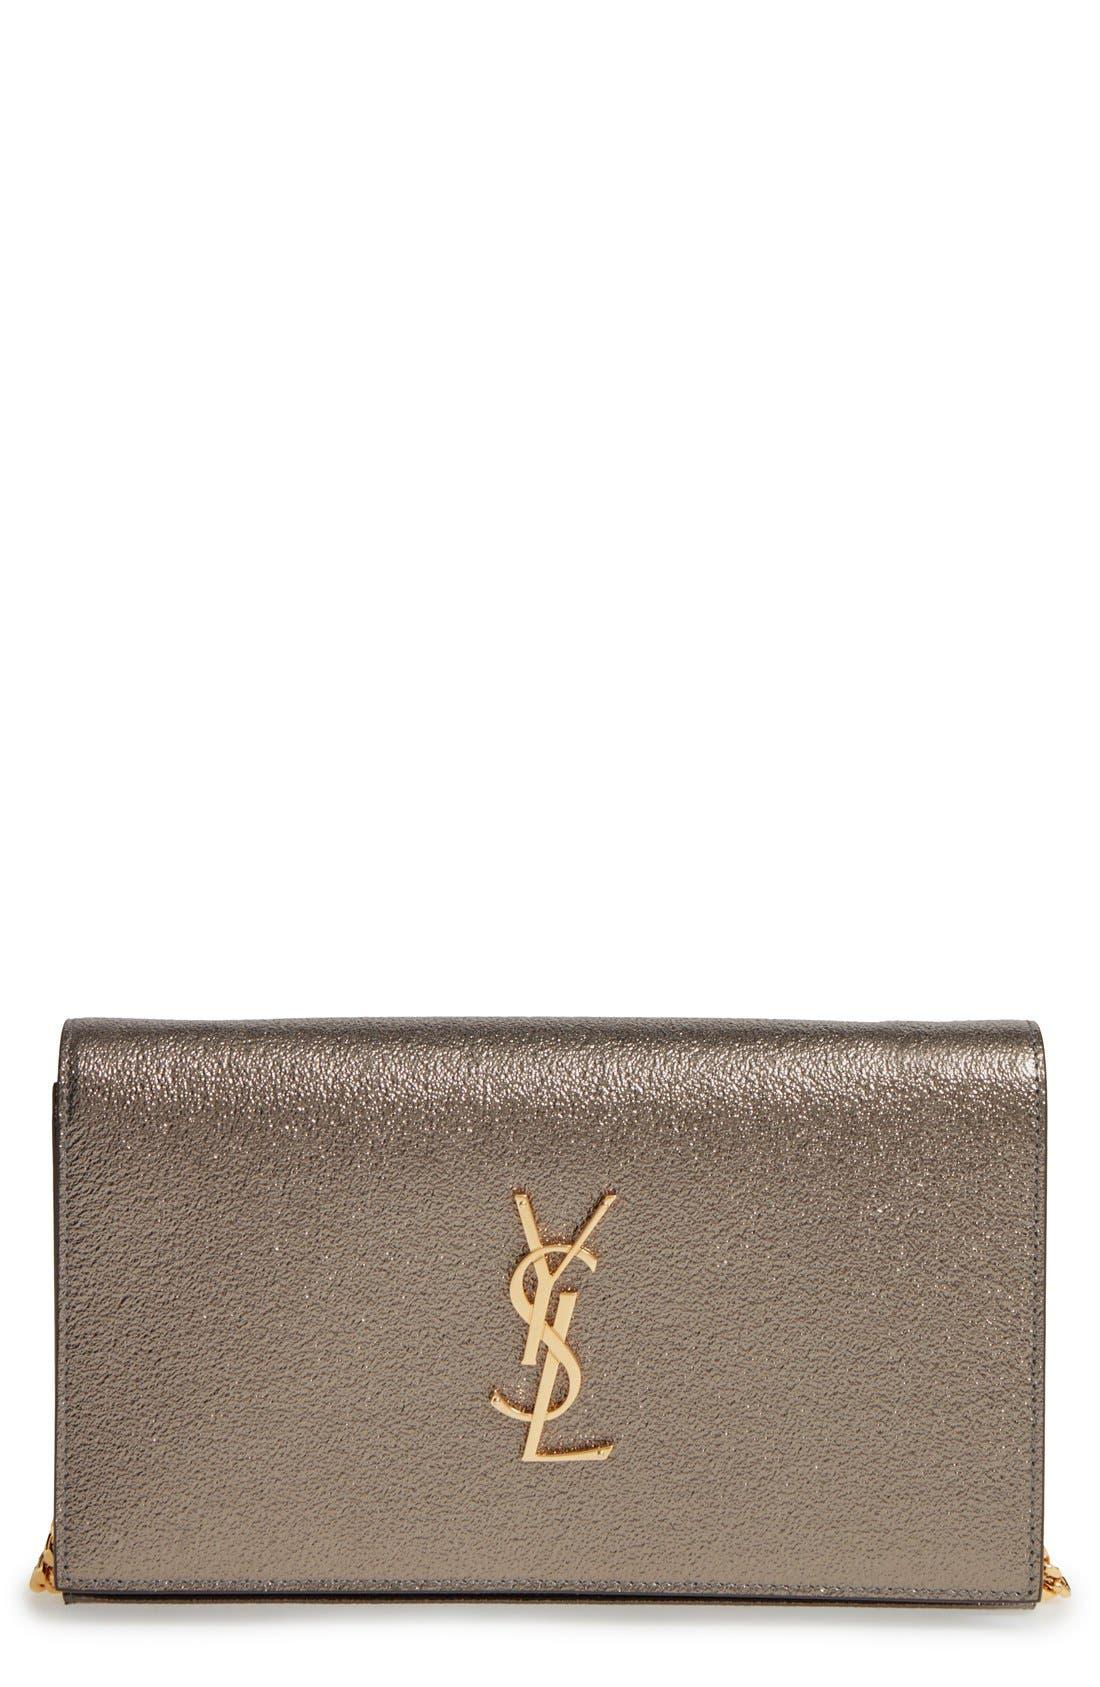 Main Image - Saint Laurent Leather Wallet on a Chain